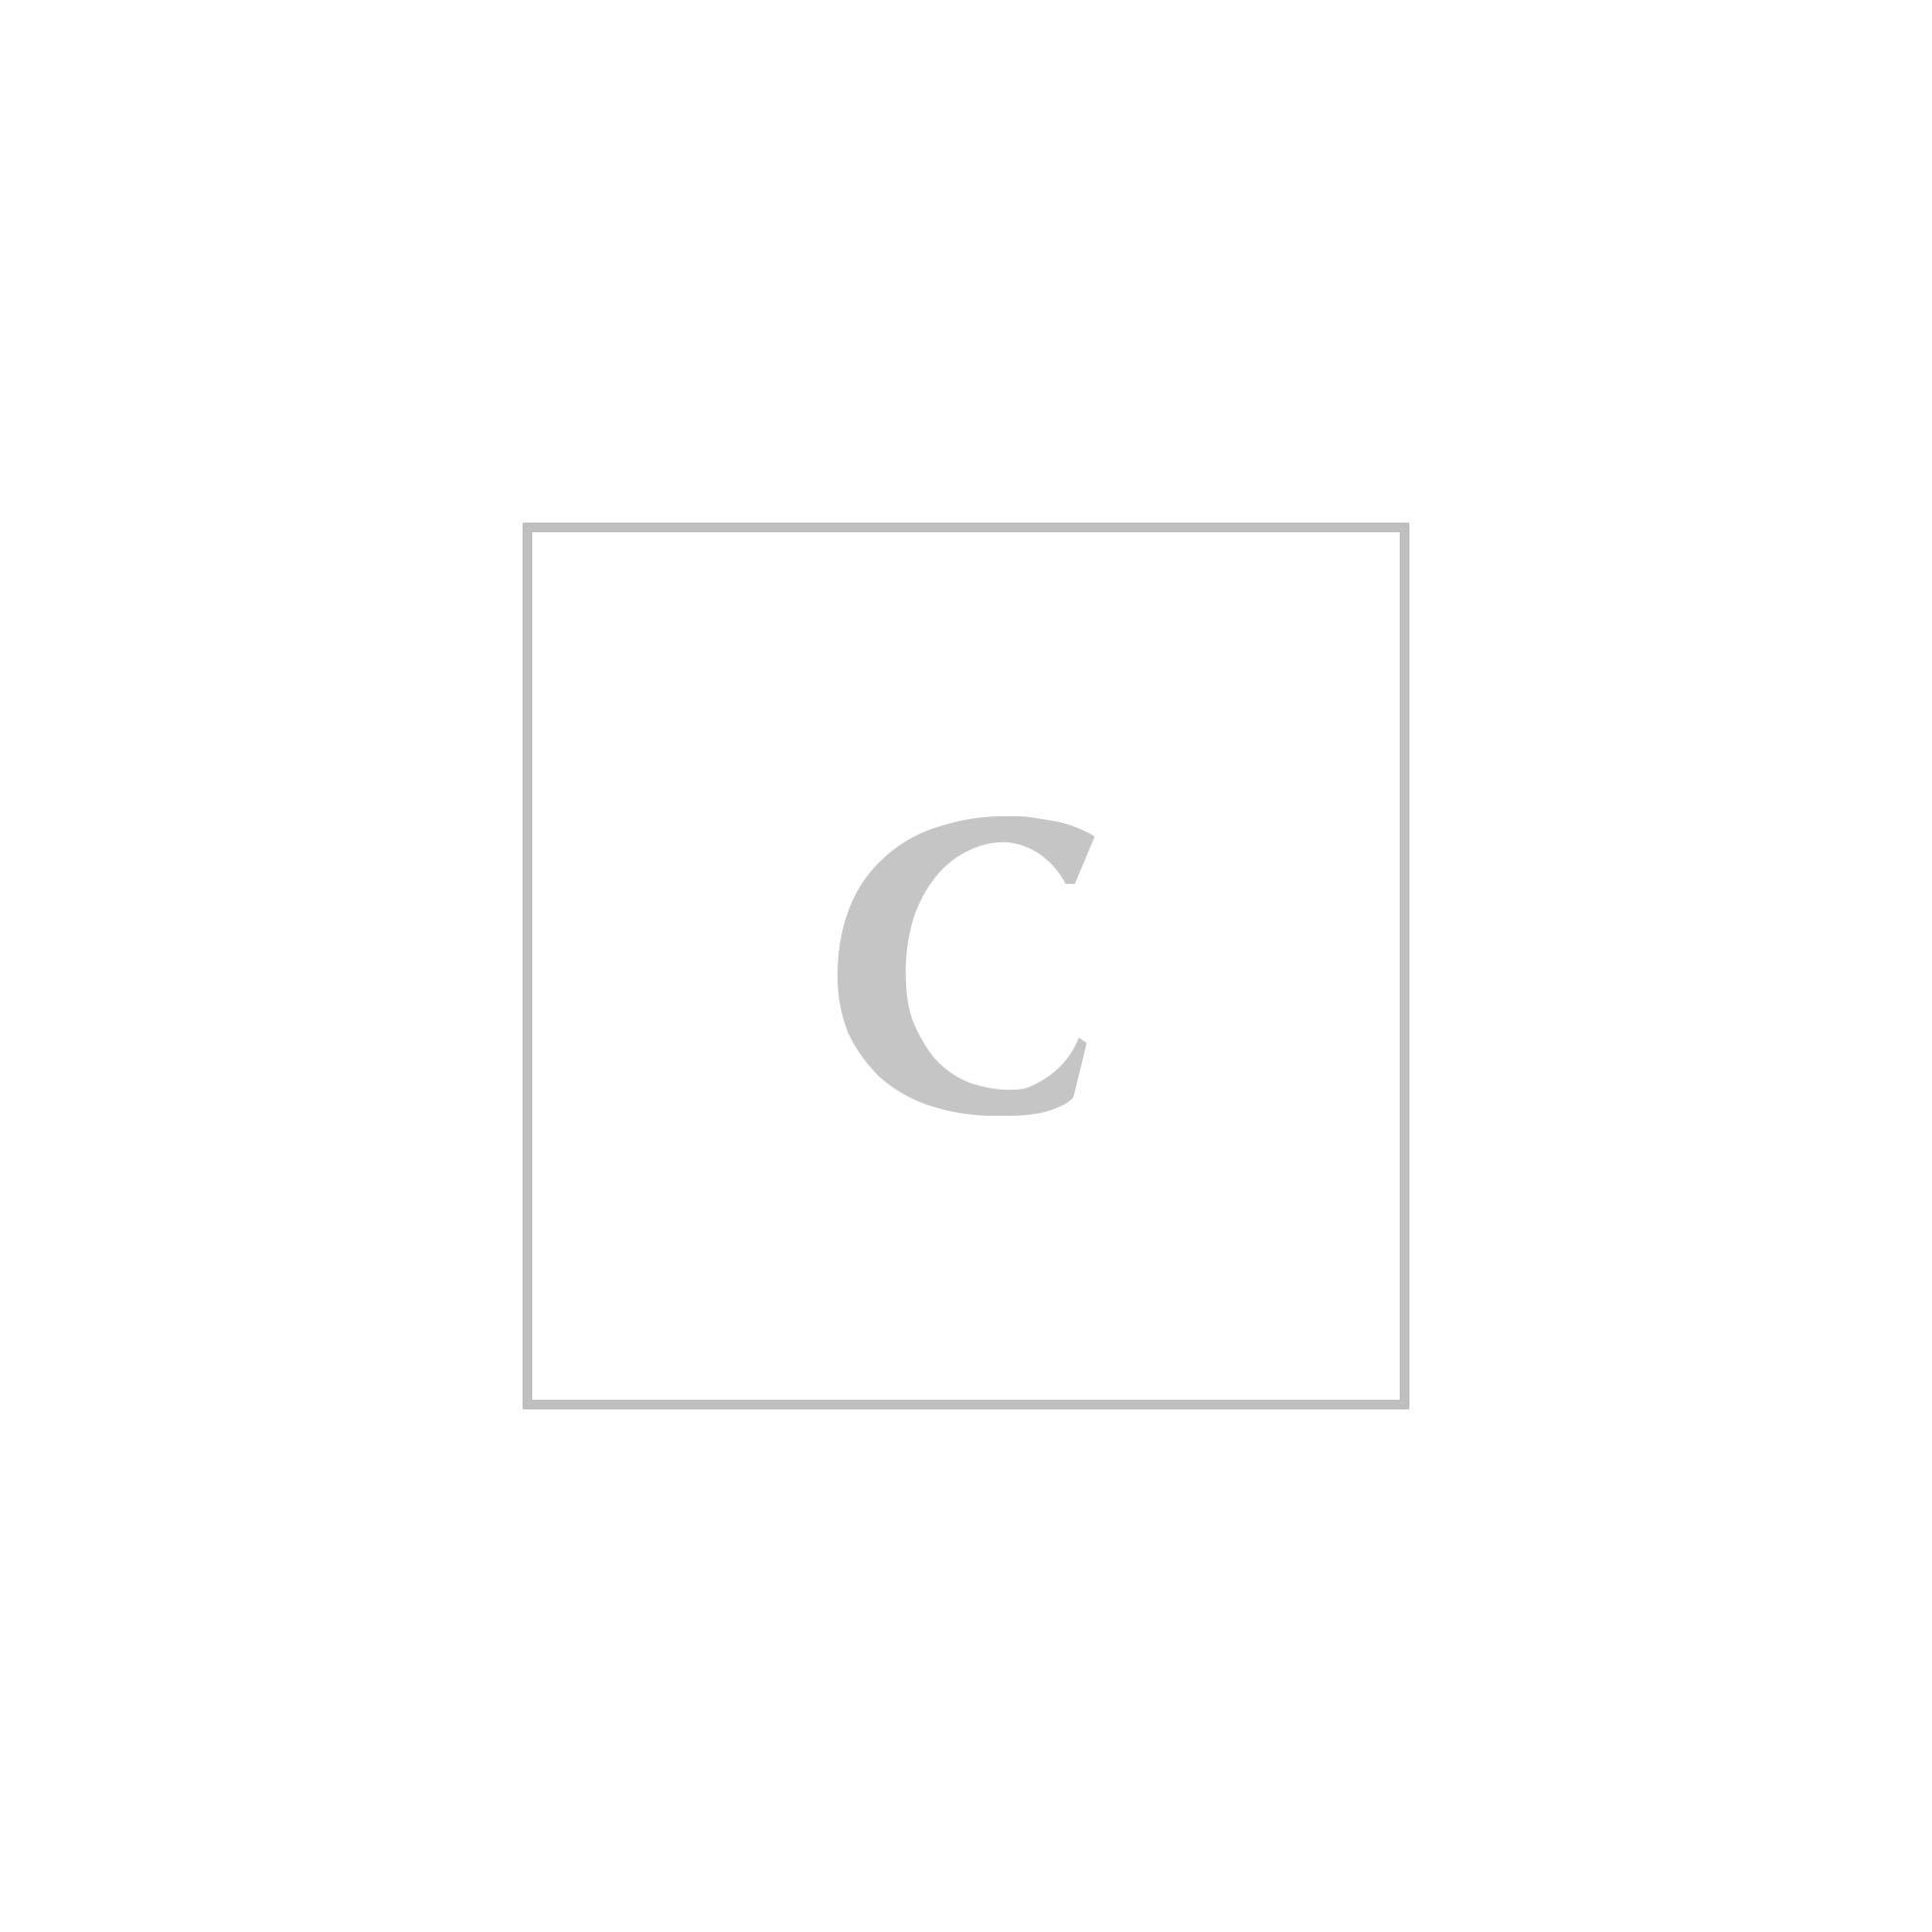 Duvetica piumino cadell